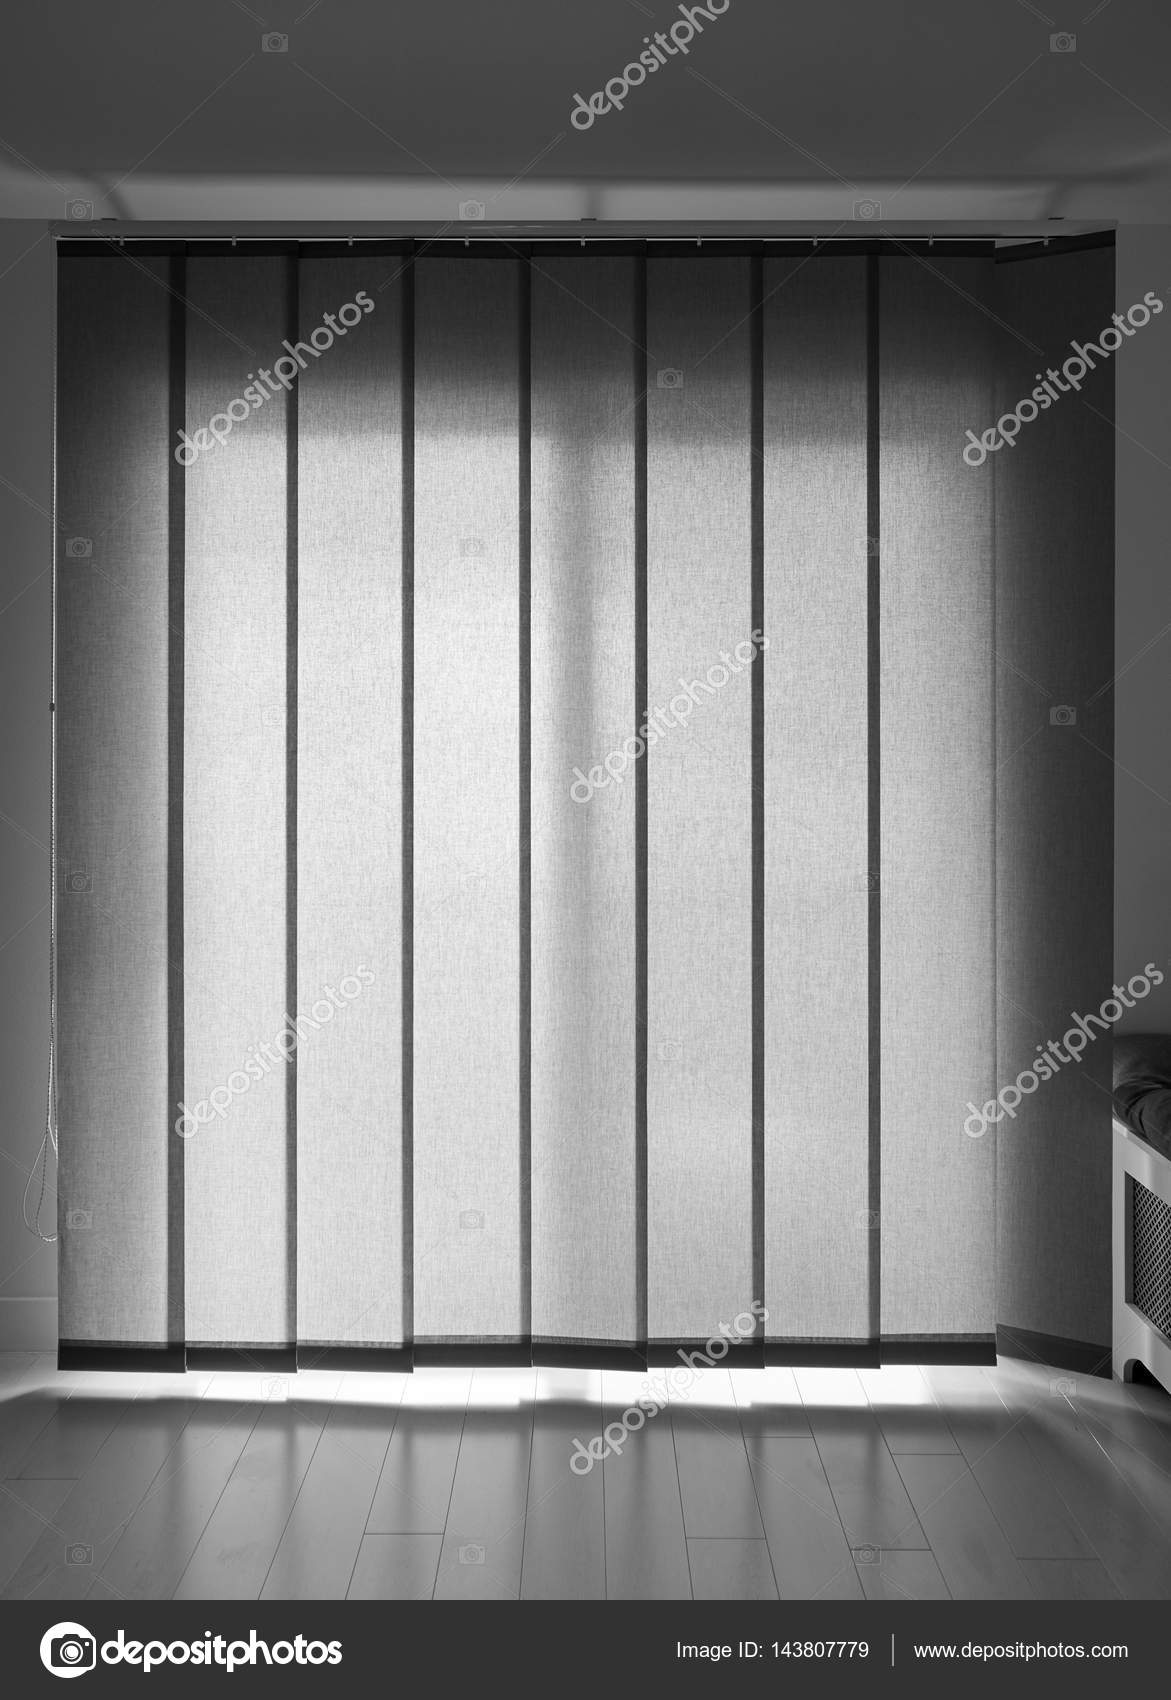 treatments window coupon cordless levolor walmart honeycoi code accordia lowes roman windows honeycomb graber wood blinds shades faux blackout cellular costco blind